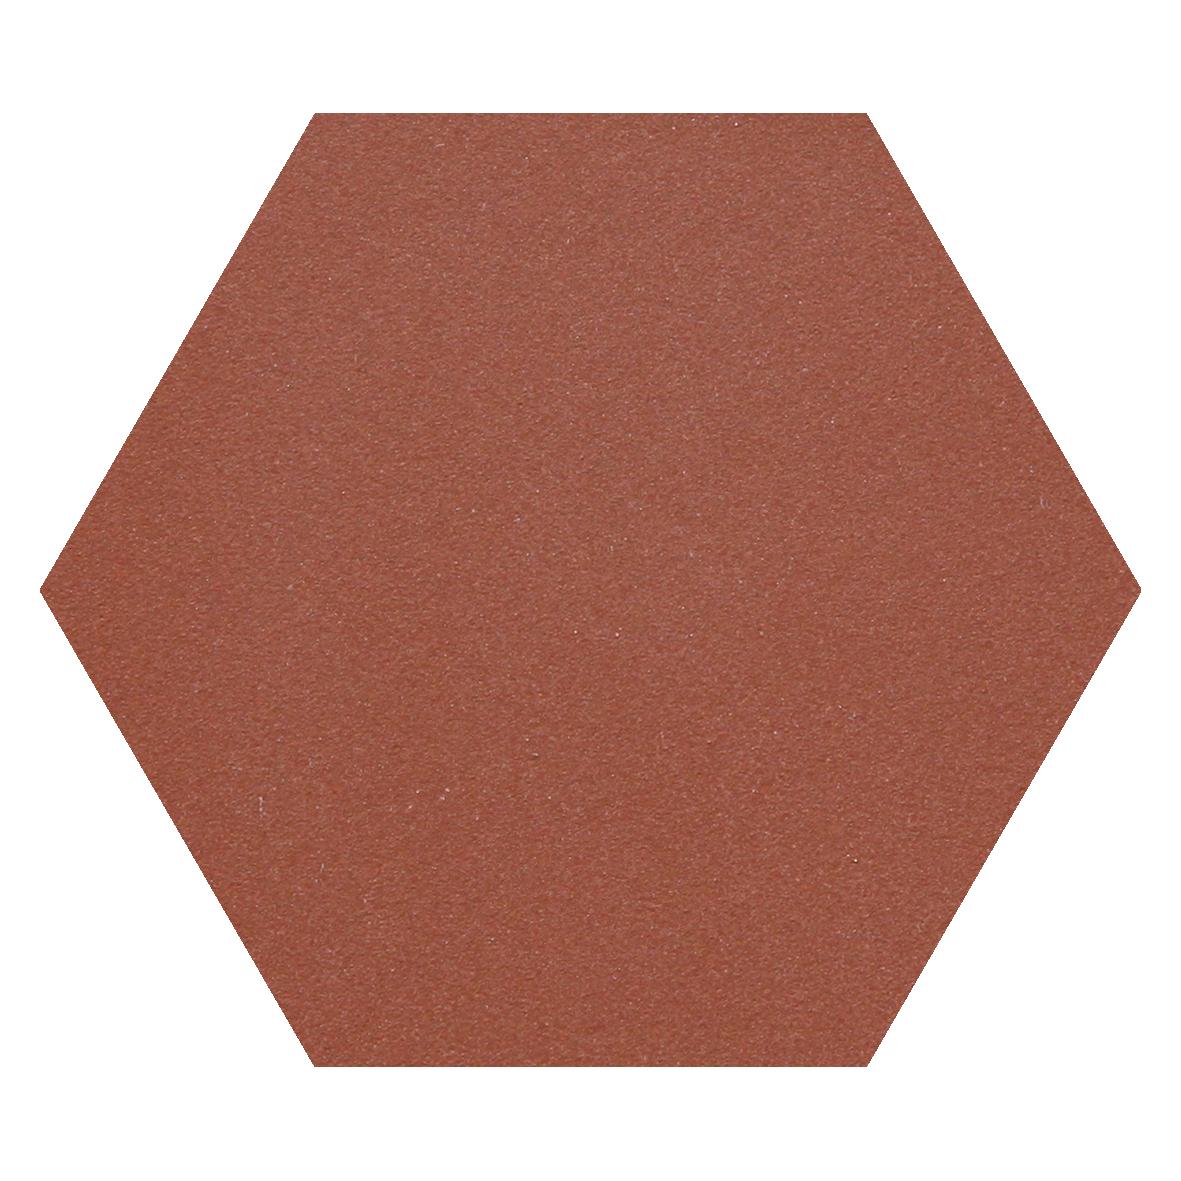 L4420HEX/1C, Natura, Punainen, lattia,pakkasenkesto,uimahalli,design_from_finland